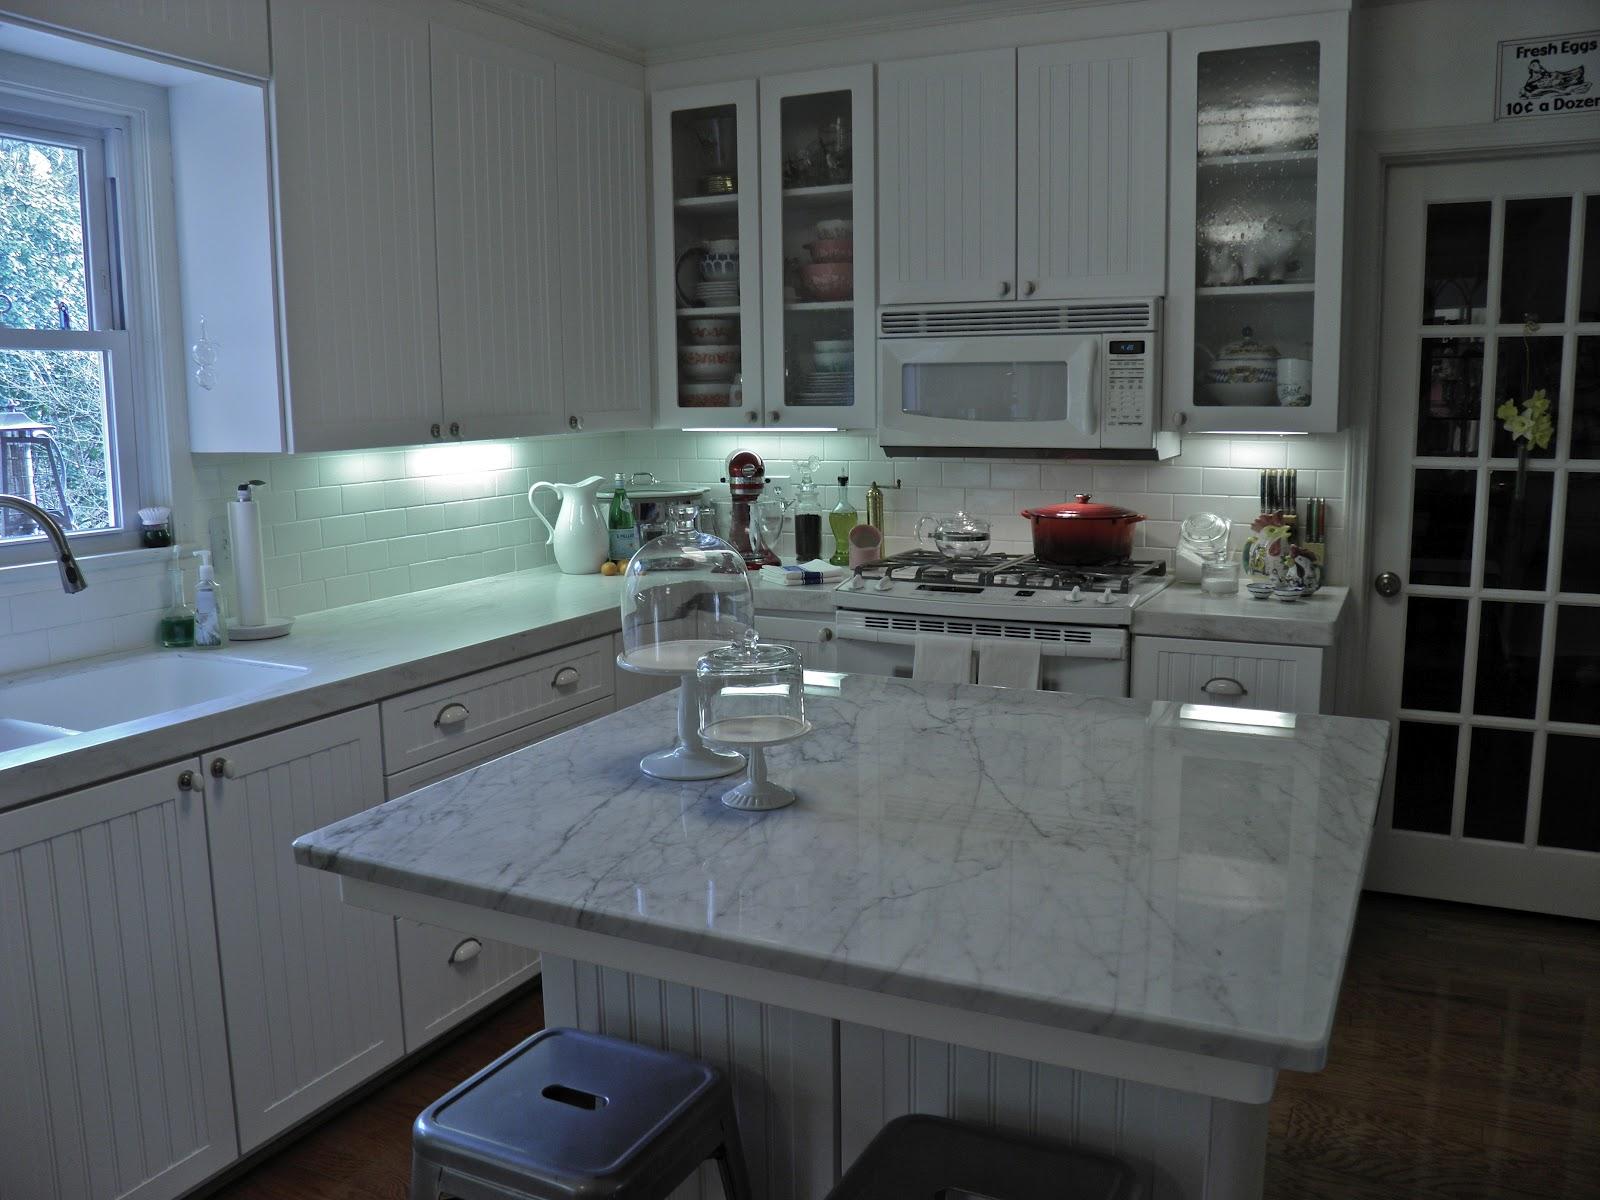 1000 Images About Batt Residence Countertops On Pinterest Quartz Countertops Carrara And